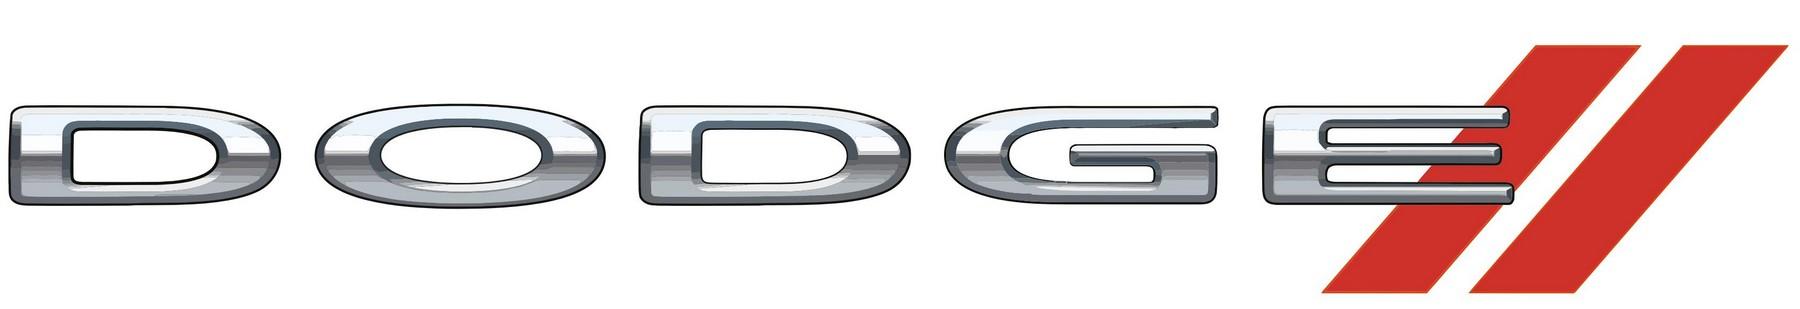 1800x309 Auto Ram Logo Vector Png Transparent Auto Ram Logo Vector.png